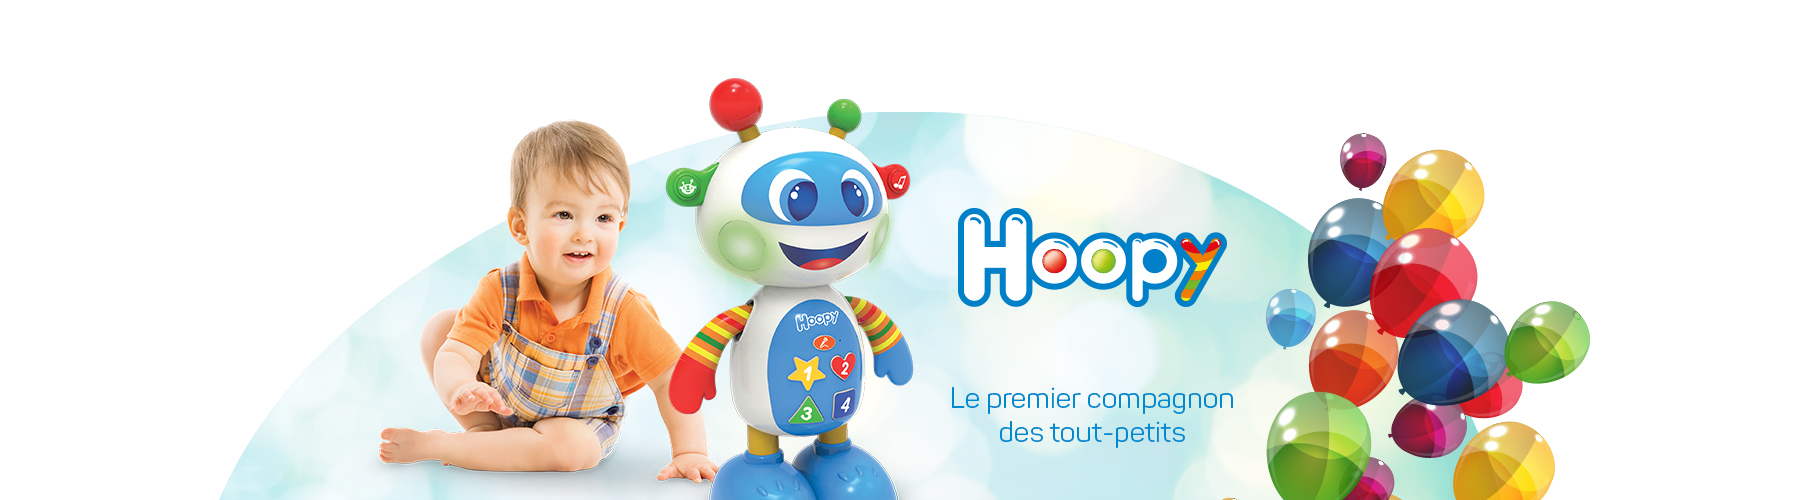 robot jouet Hoopy Ouaps de WowWee